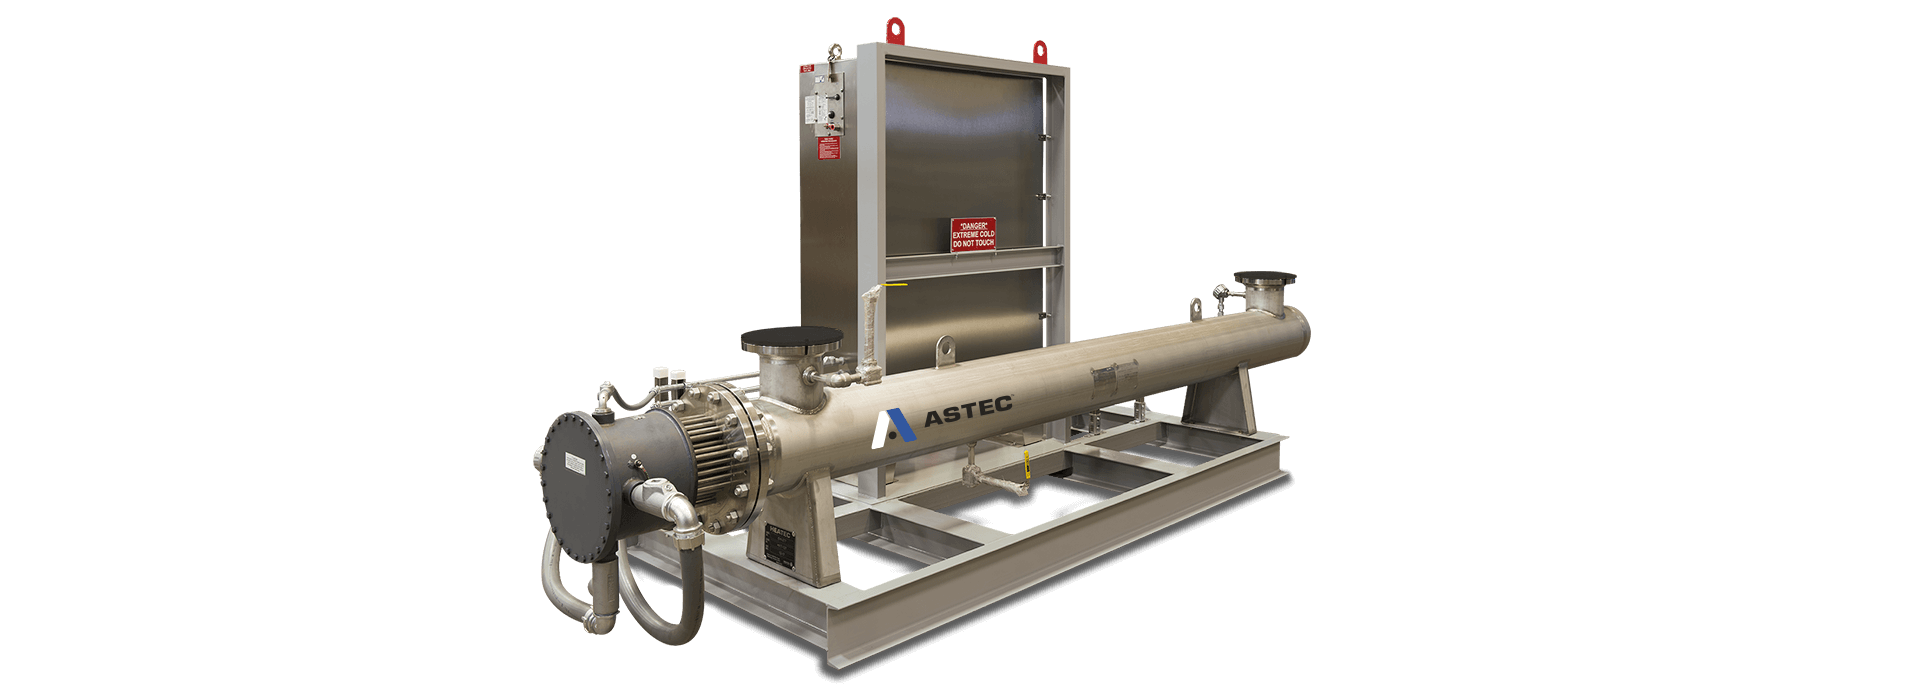 Heatec EHI Electric Process Heater